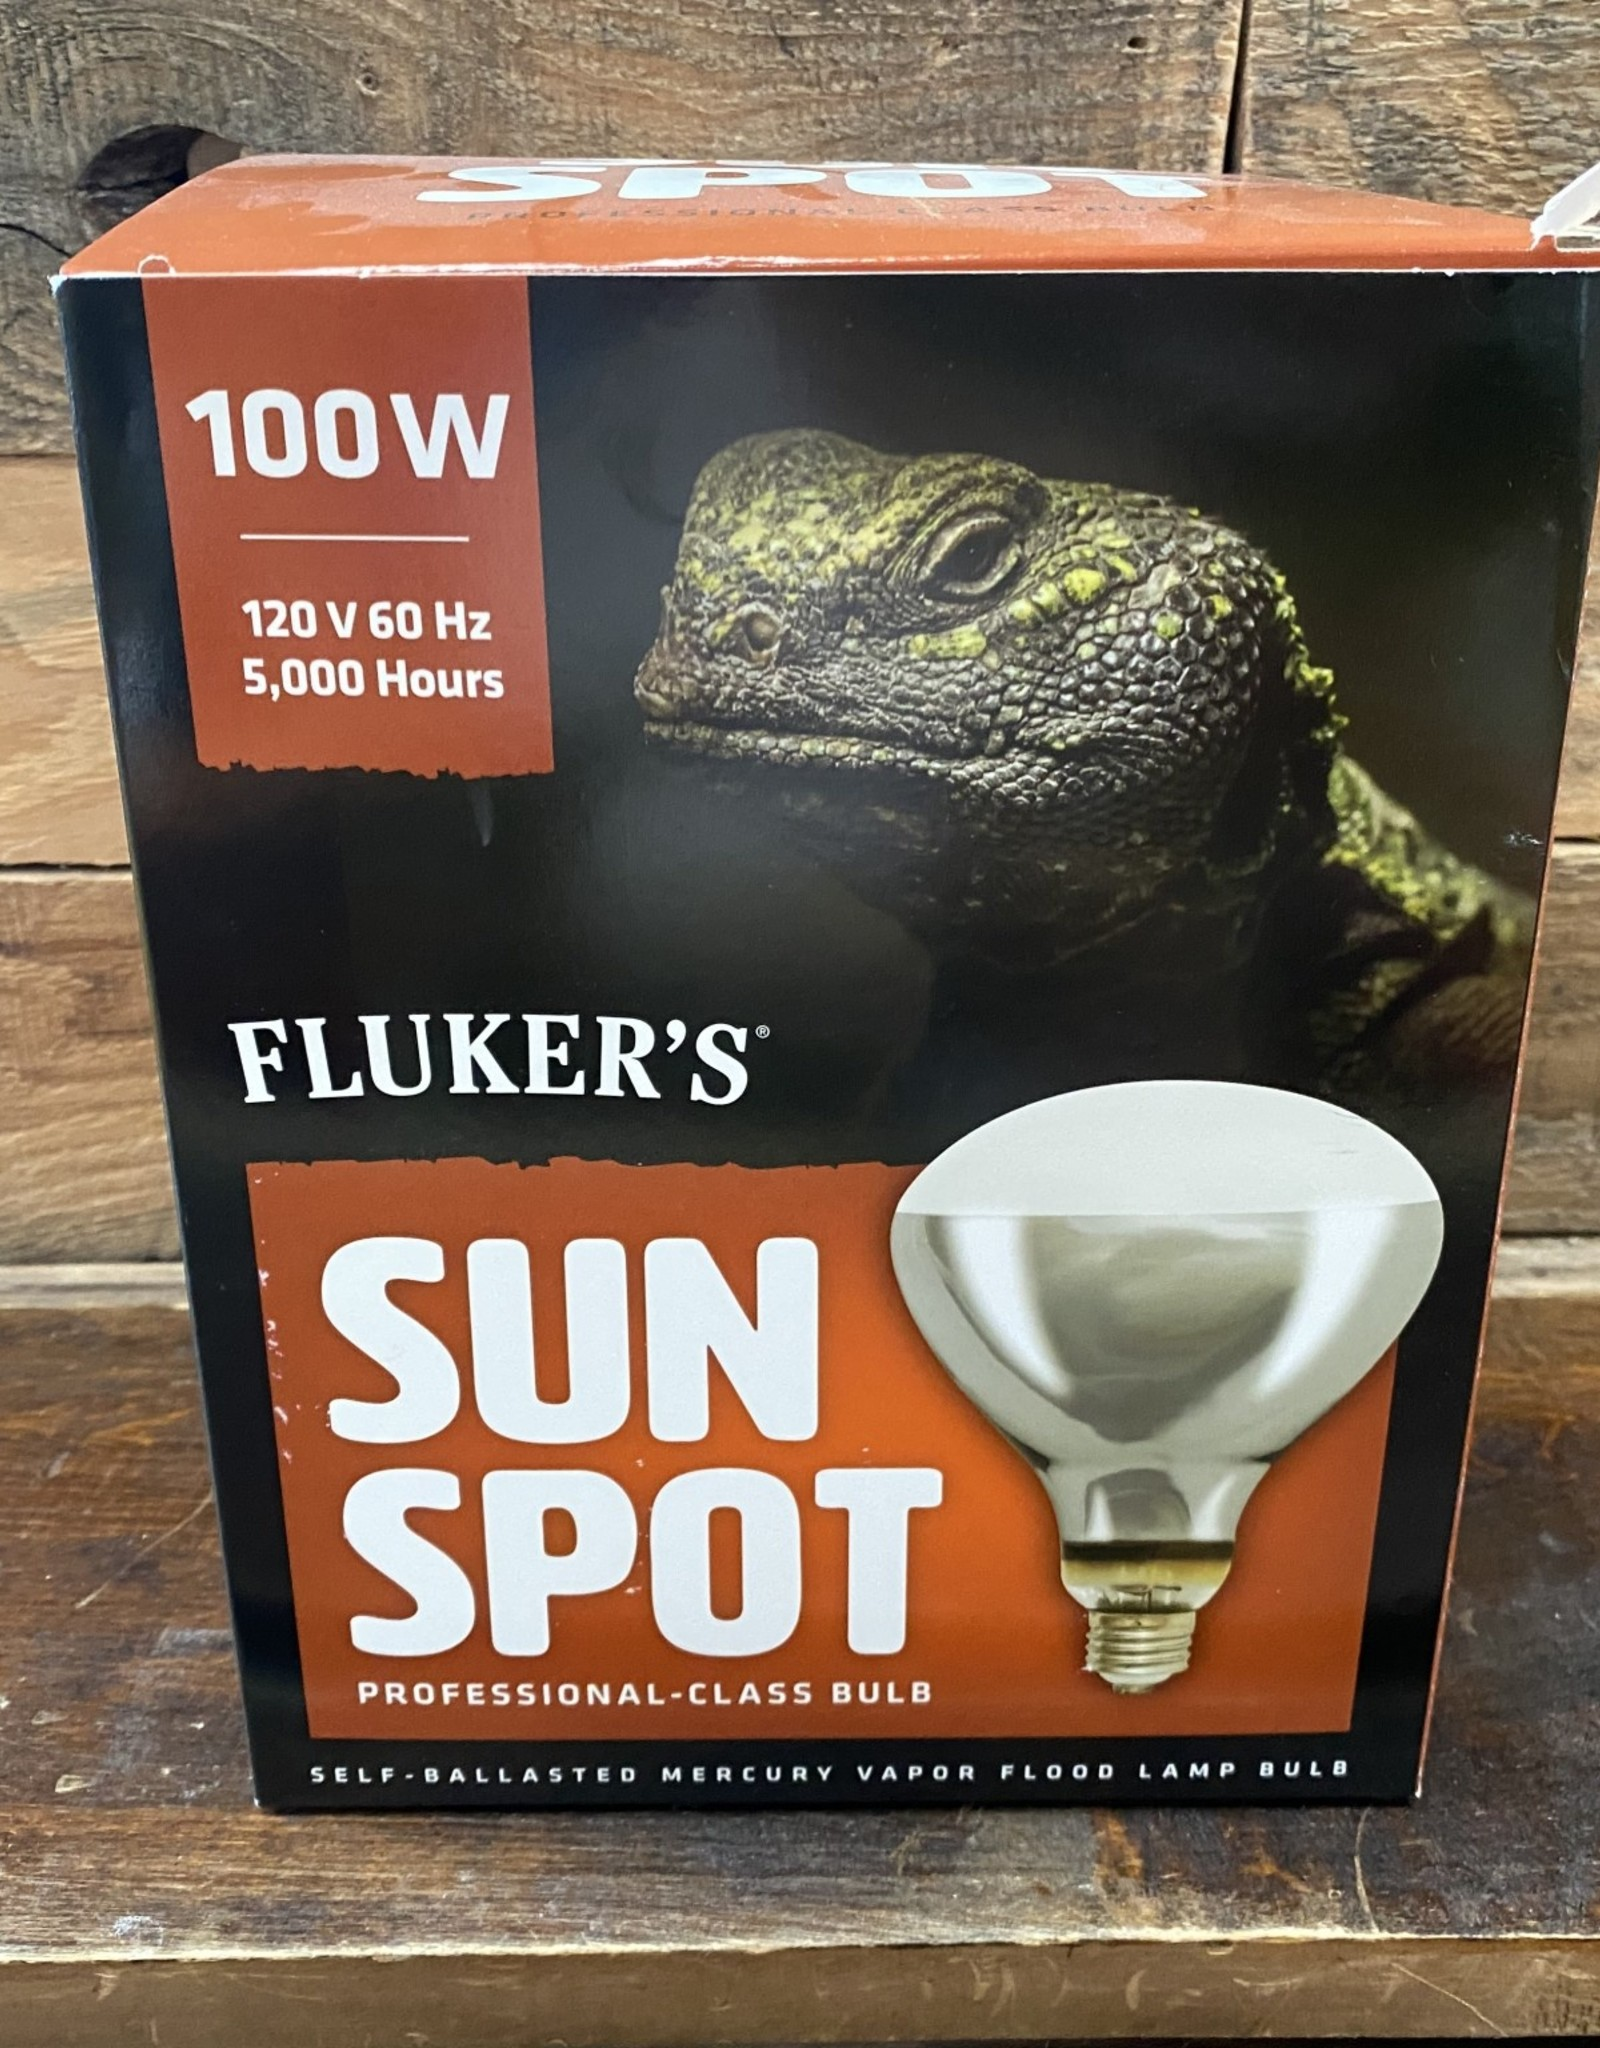 FLUKER FARMS 100 W. SUN SPOT BULB